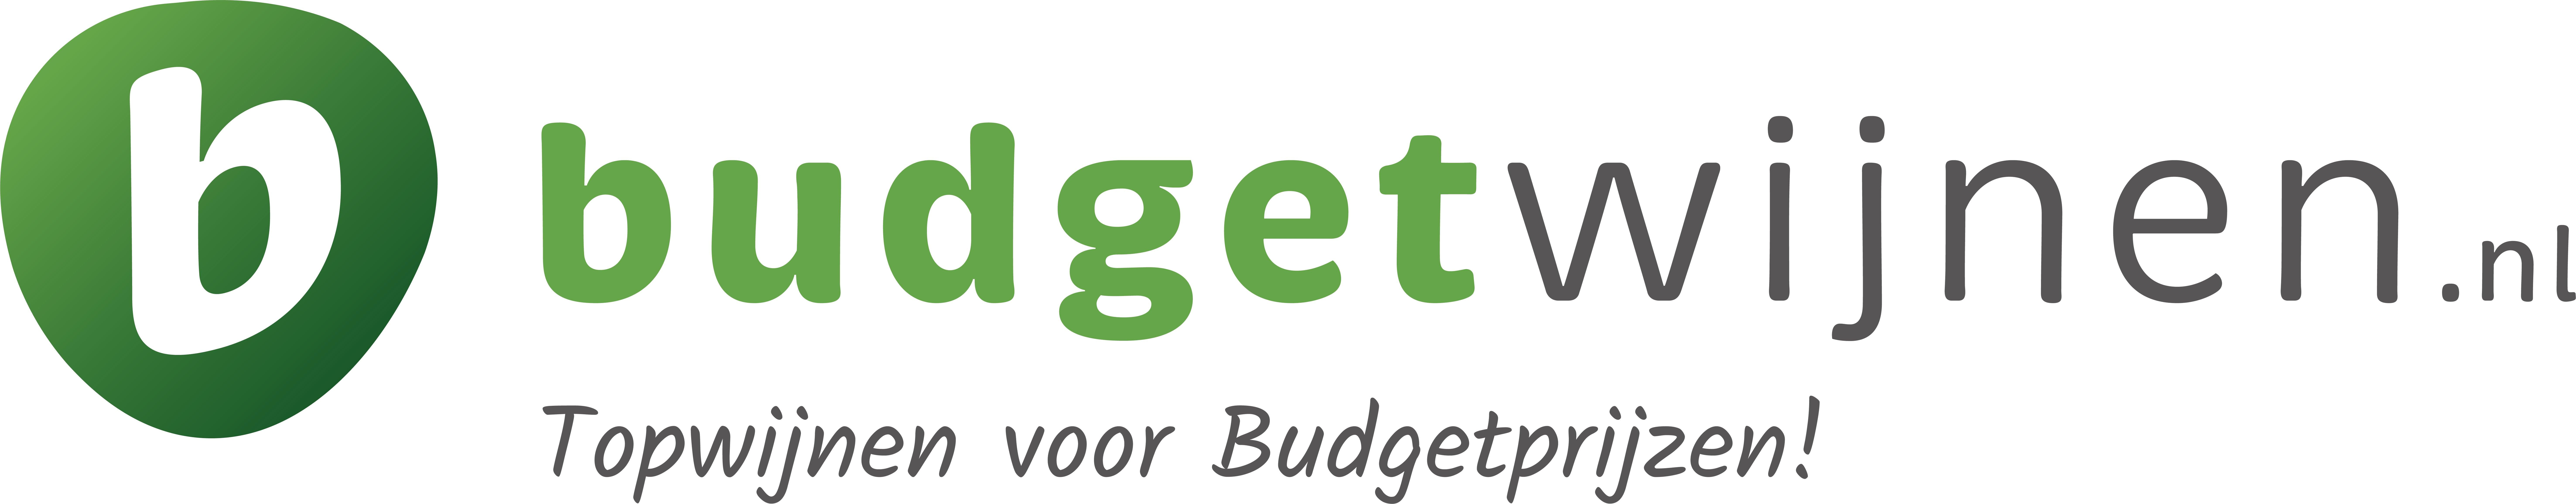 Budgetwijnen